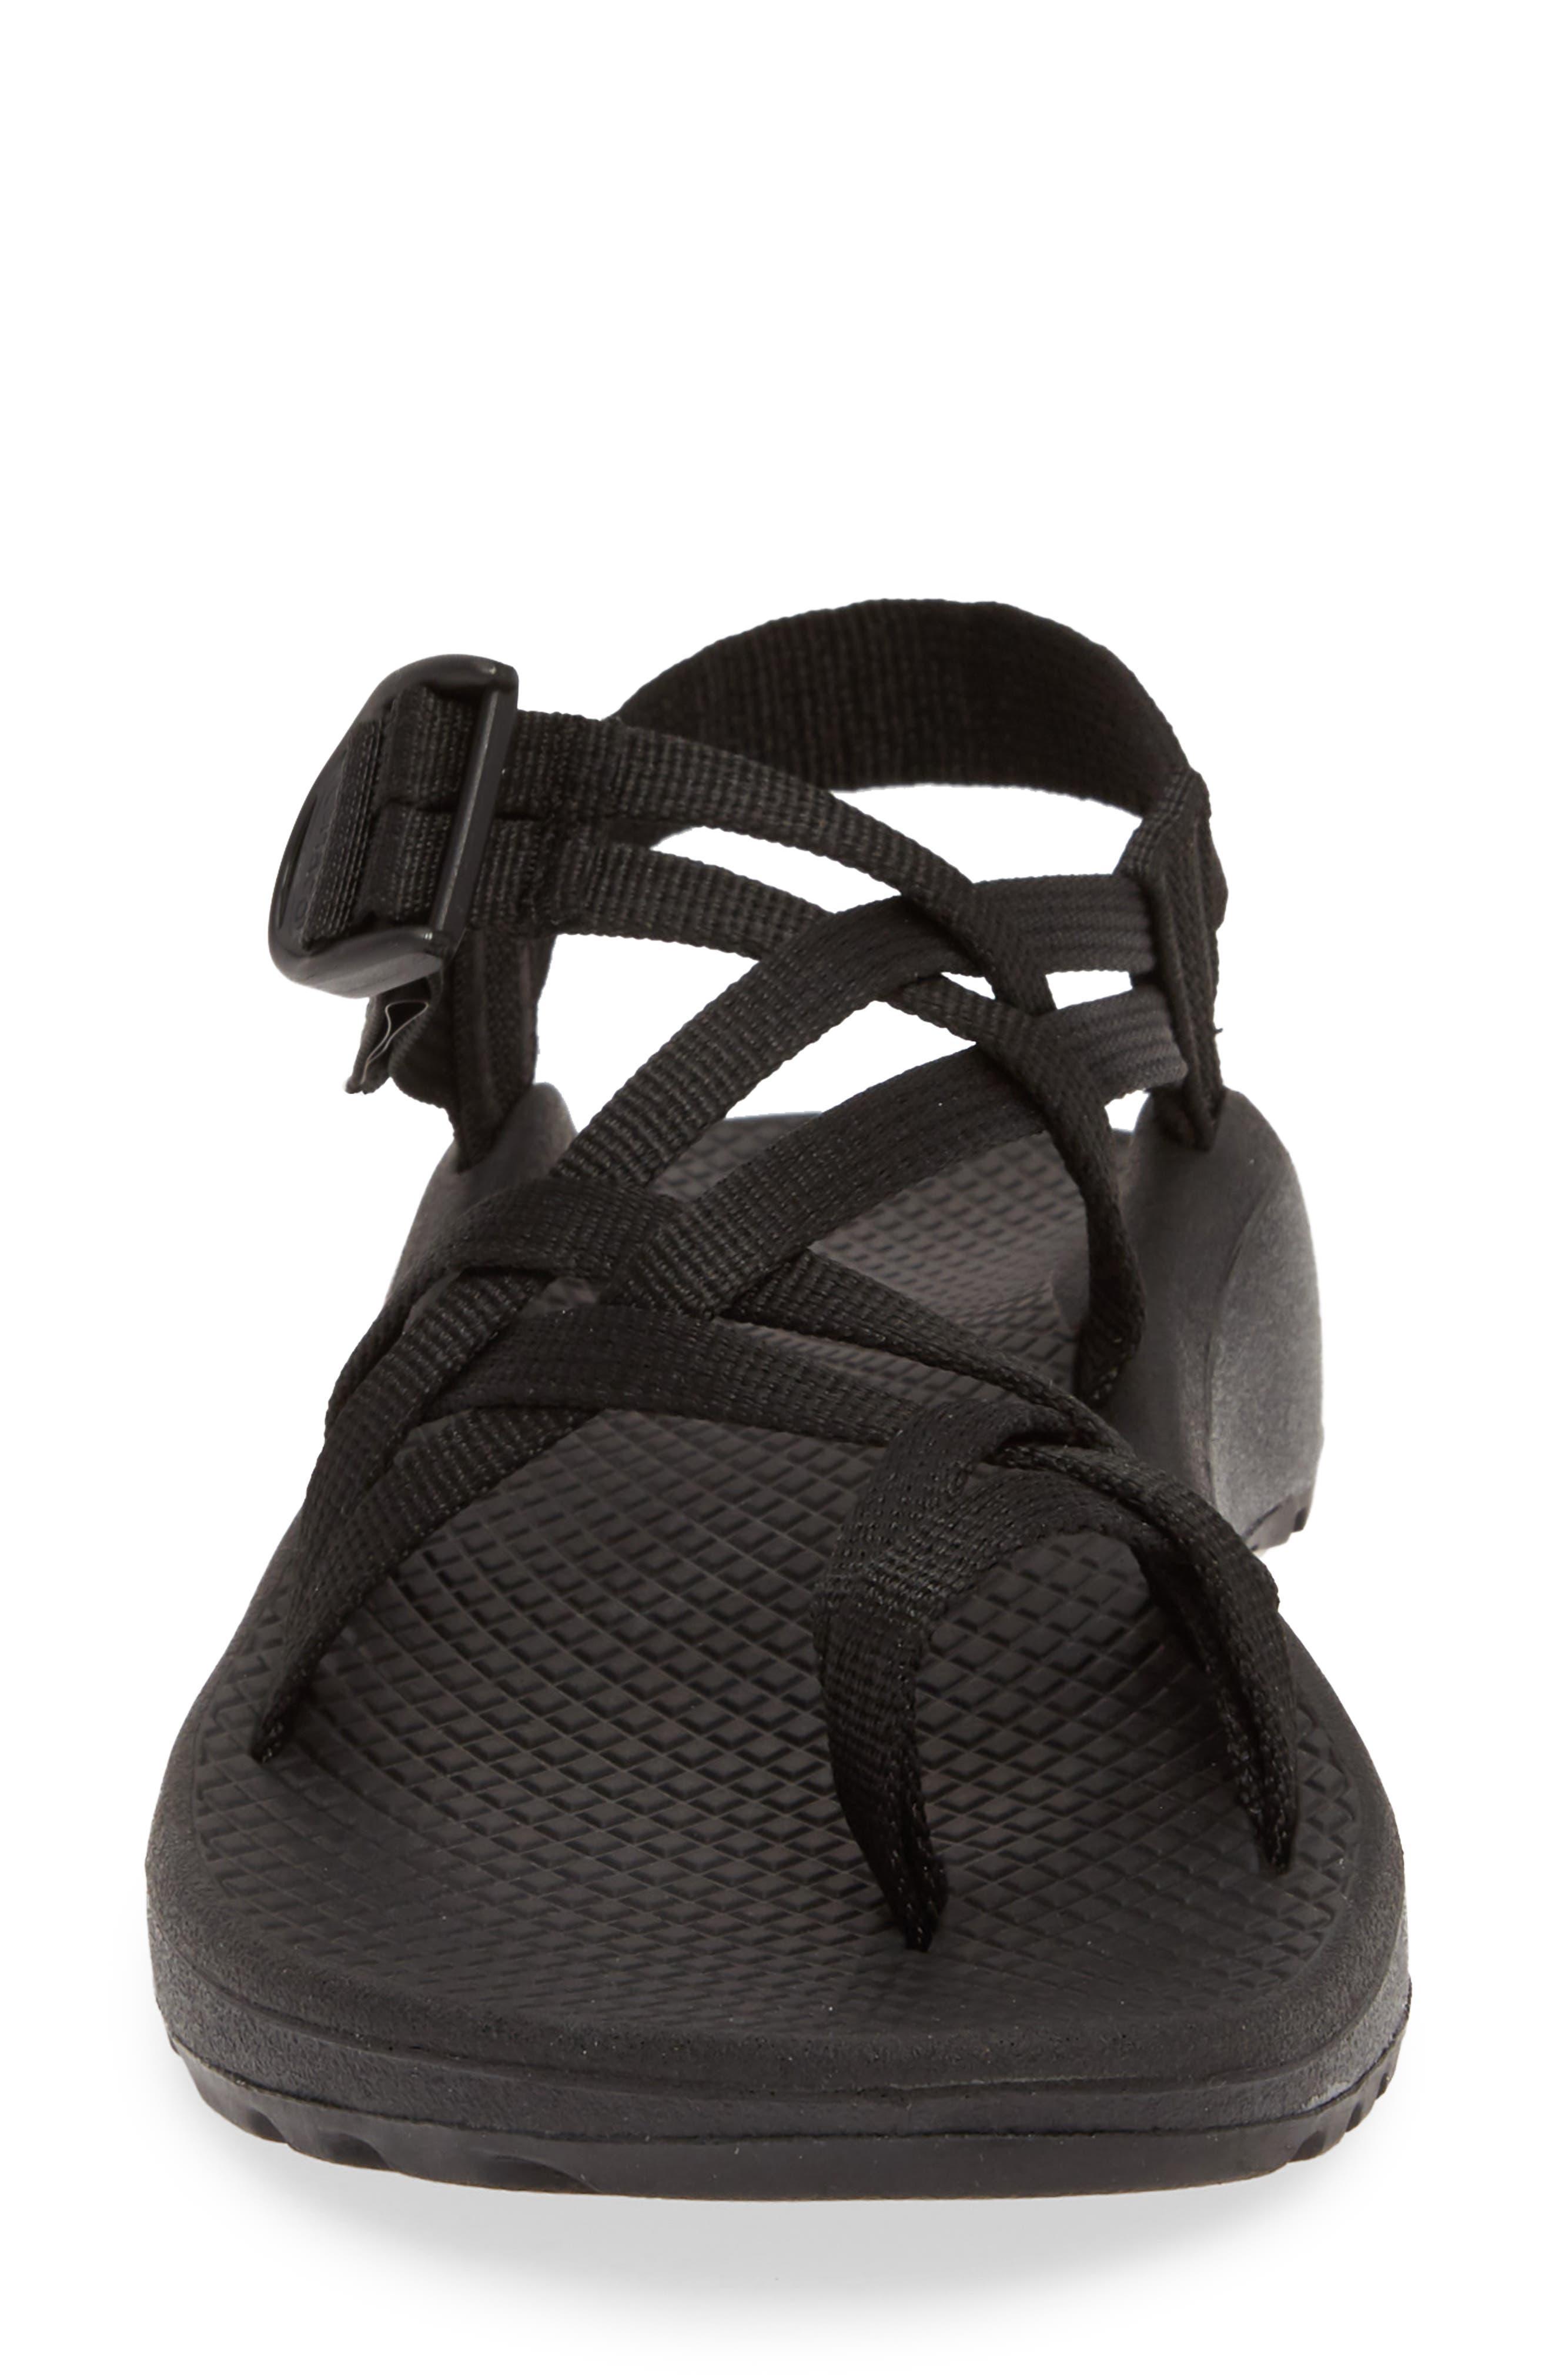 CHACO,                             Z/Cloud X2 Sandal,                             Alternate thumbnail 4, color,                             SOLID BLACK FABRIC